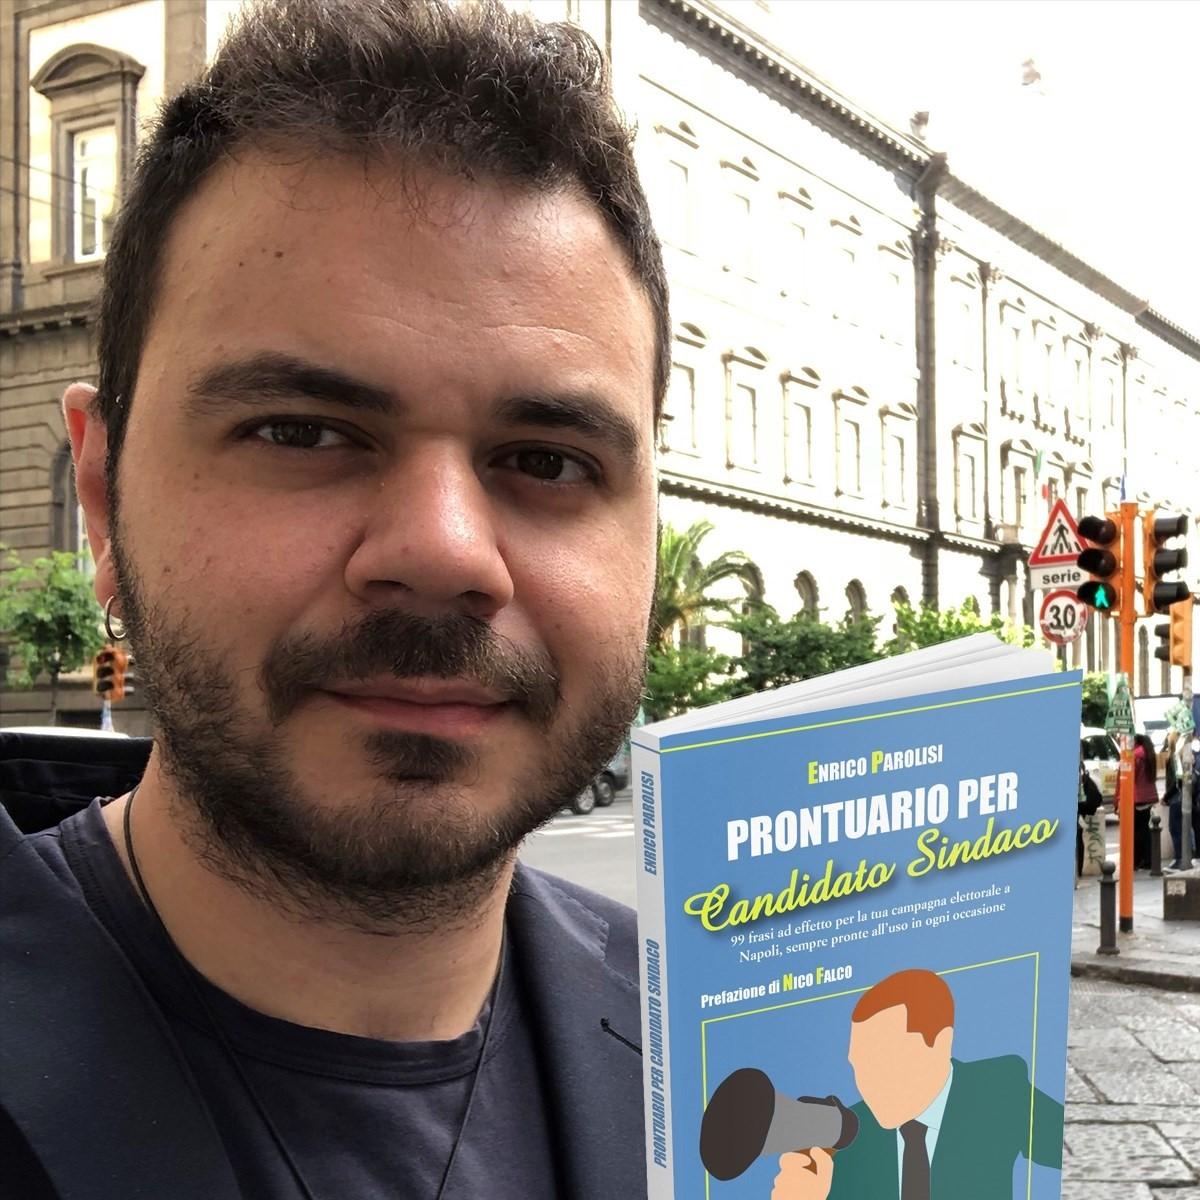 Prontuario per candidato sindaco Enrico Parolisi